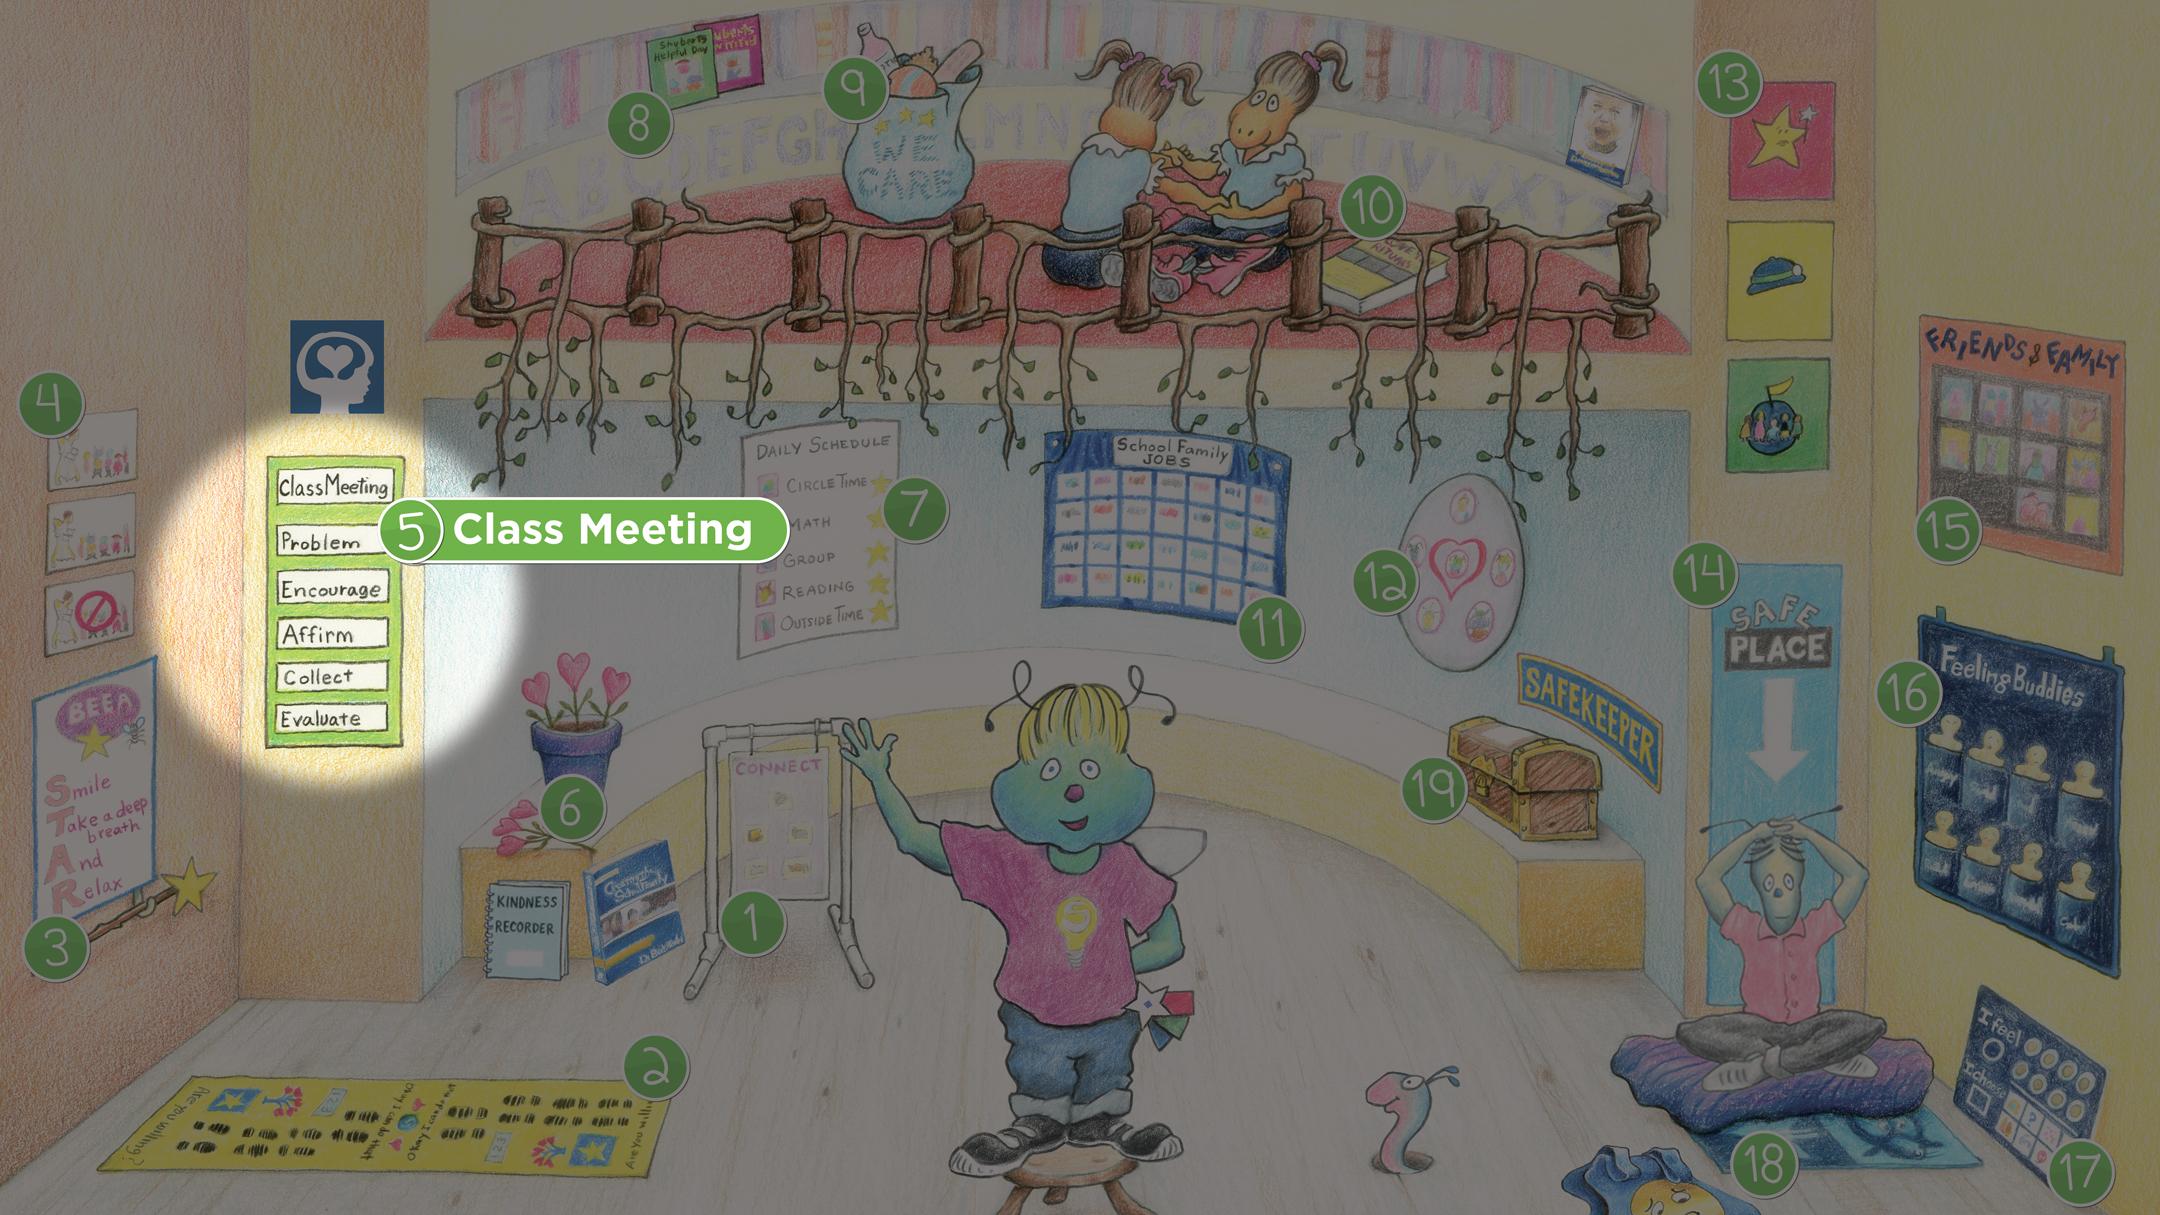 Shuberts Classroom Class Meeting